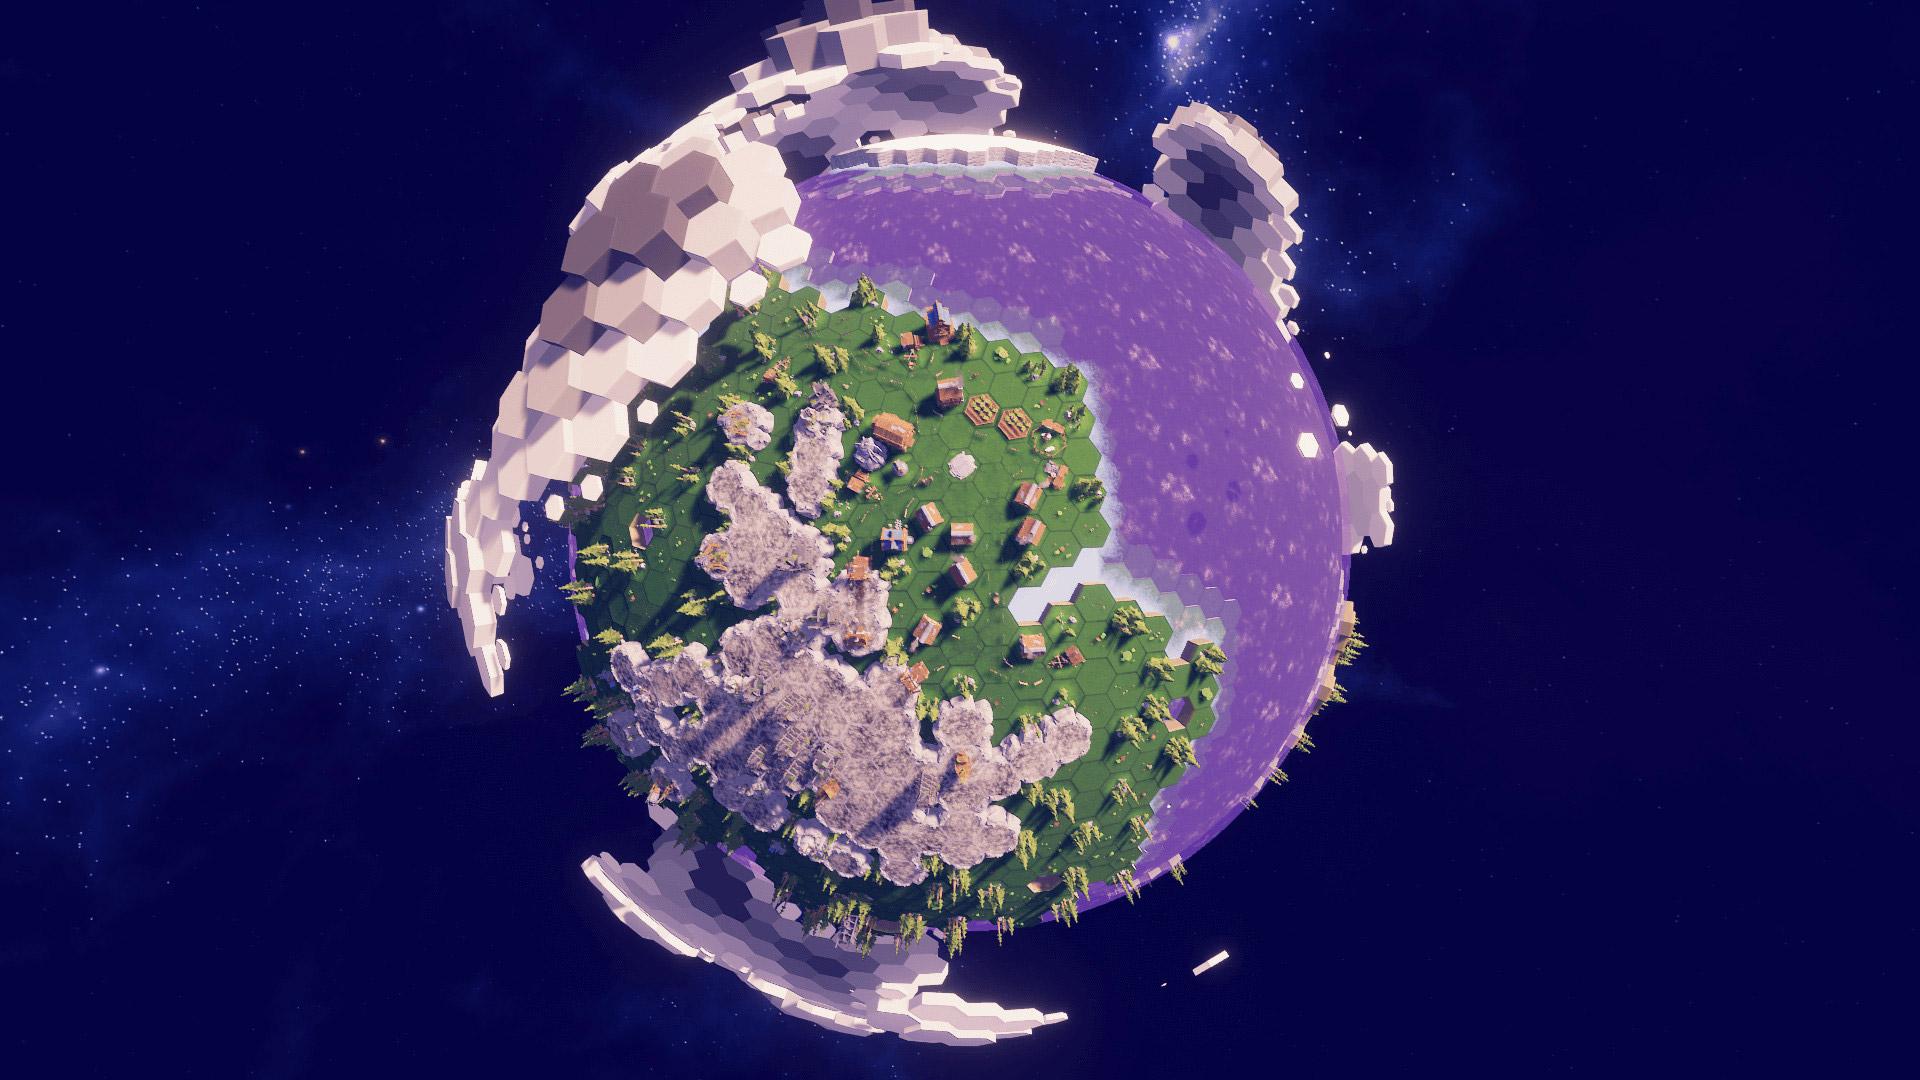 General 1920x1080 Before We Leave artwork digital art planet video games hexagon